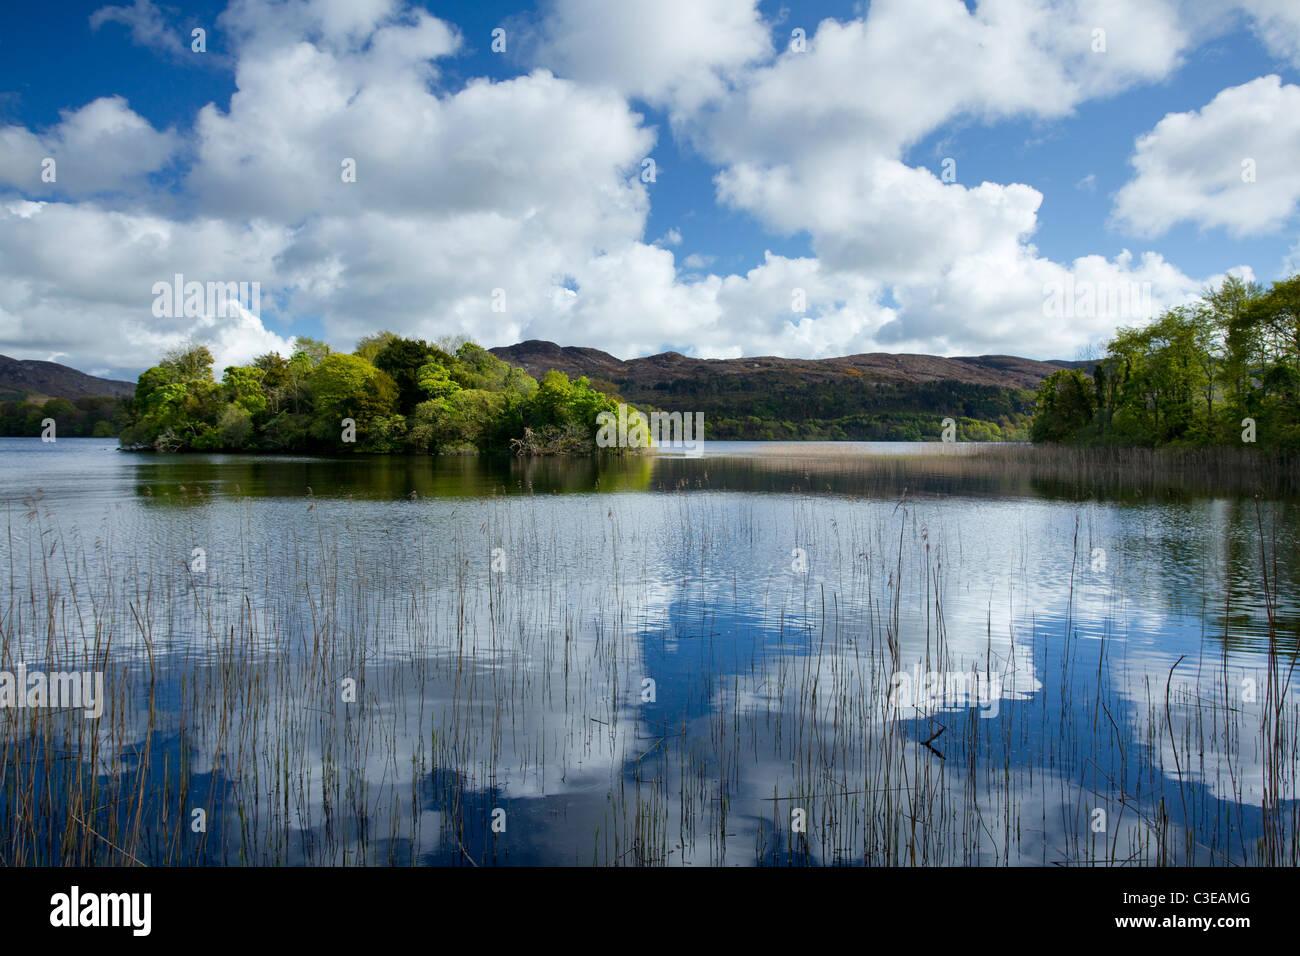 Sommer Reflexionen, Lough Gill, County Sligo, Irland. Stockbild